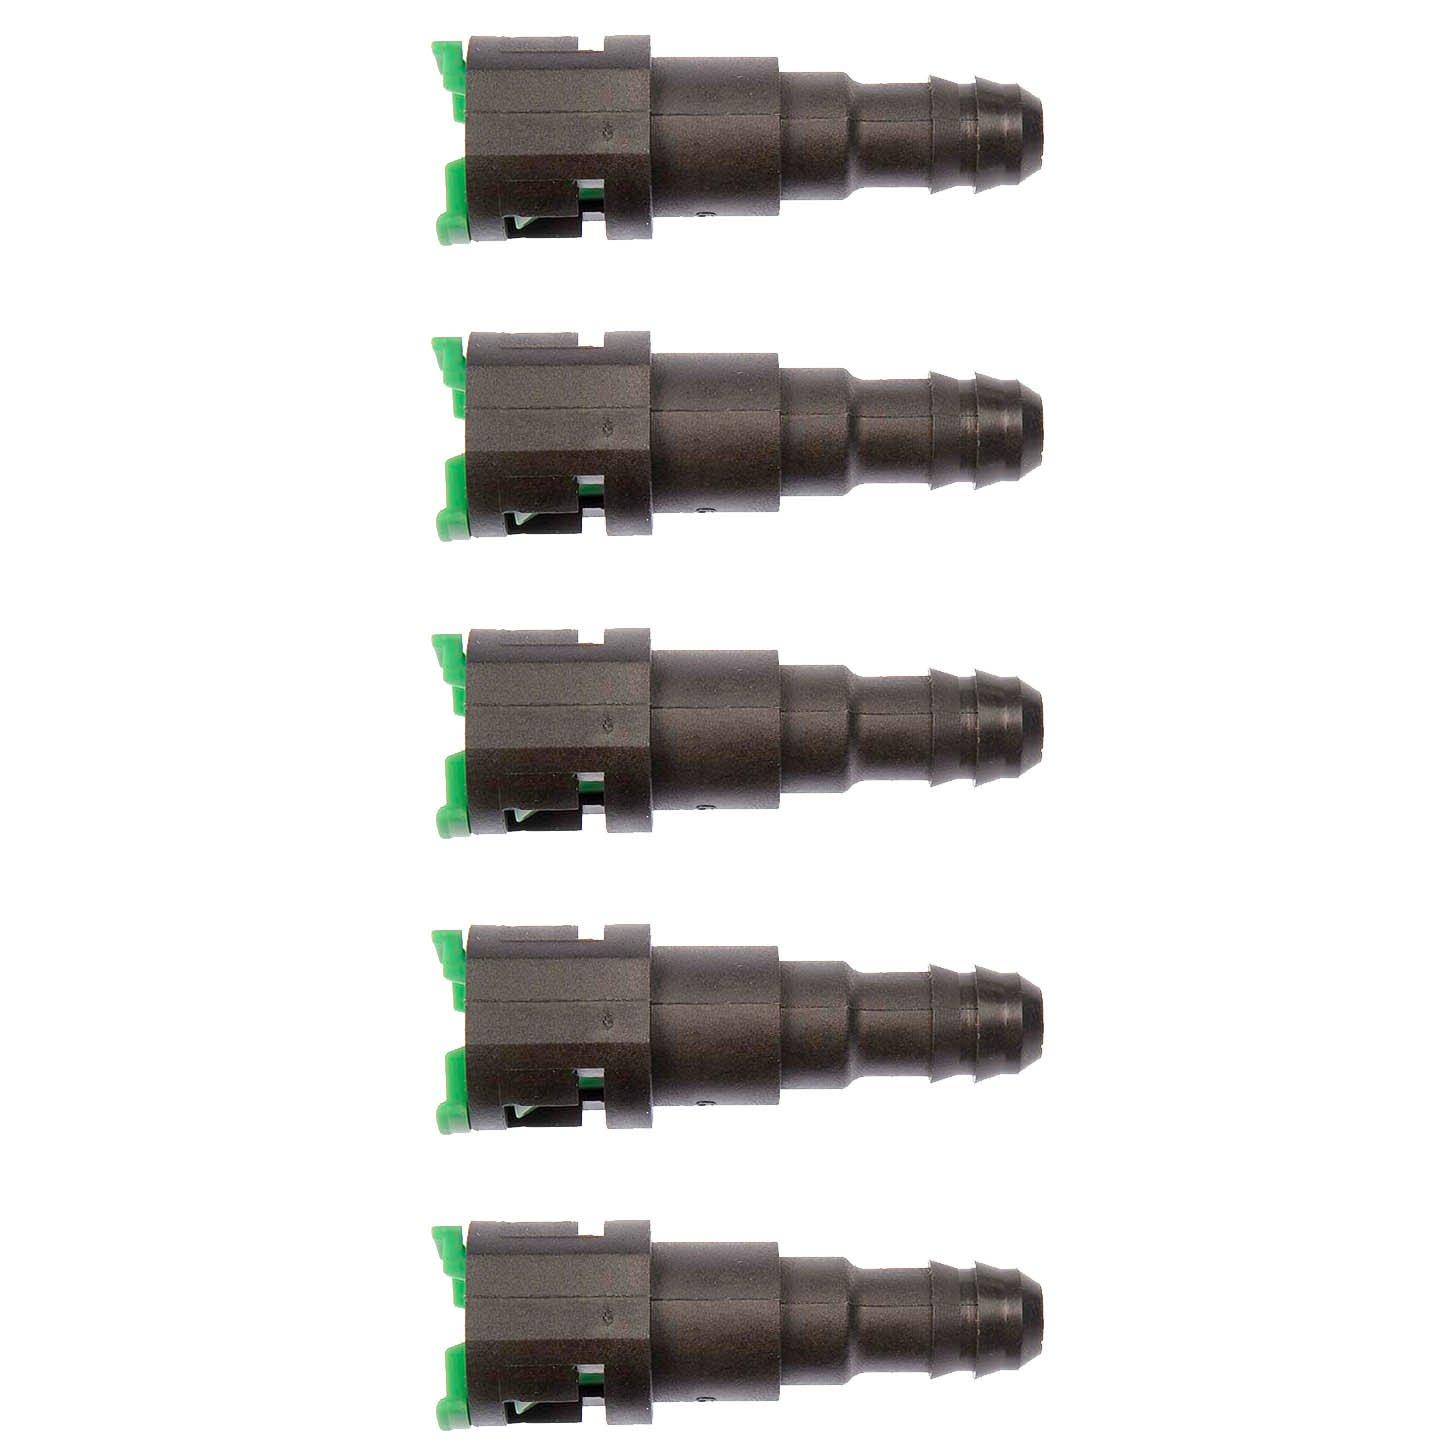 Motormite Dorman 800-084.5 FUEL LINE CONNEC